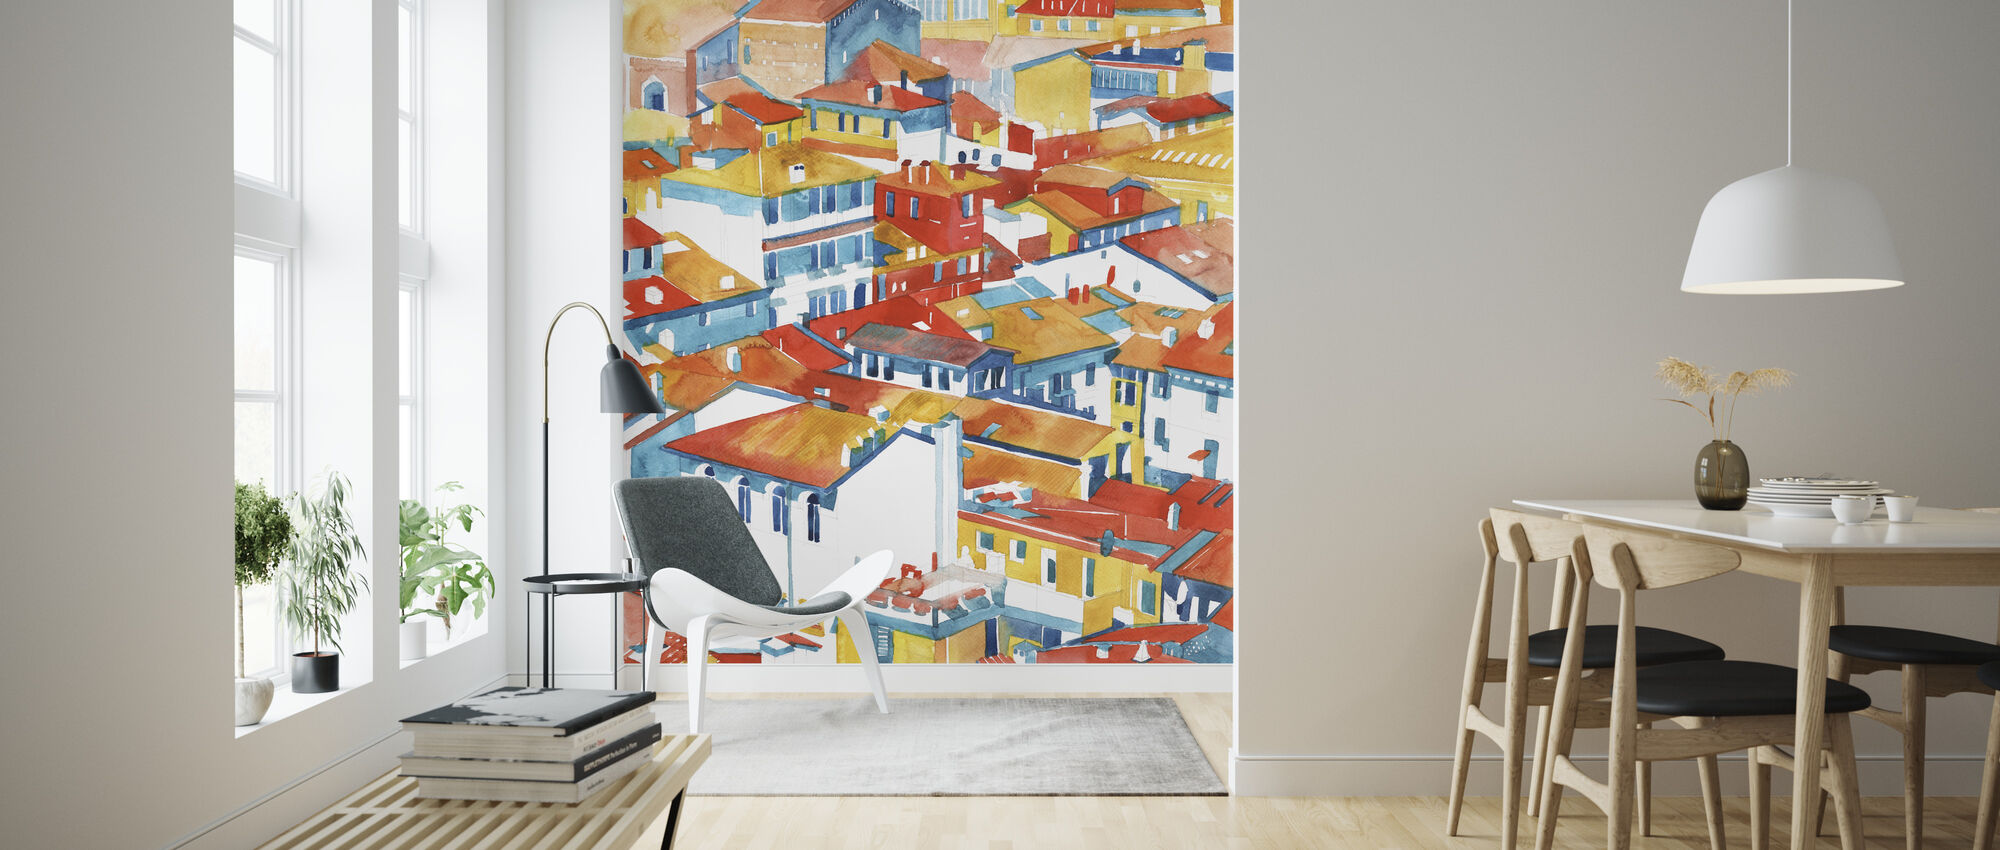 Verona Buildings - Wallpaper - Living Room